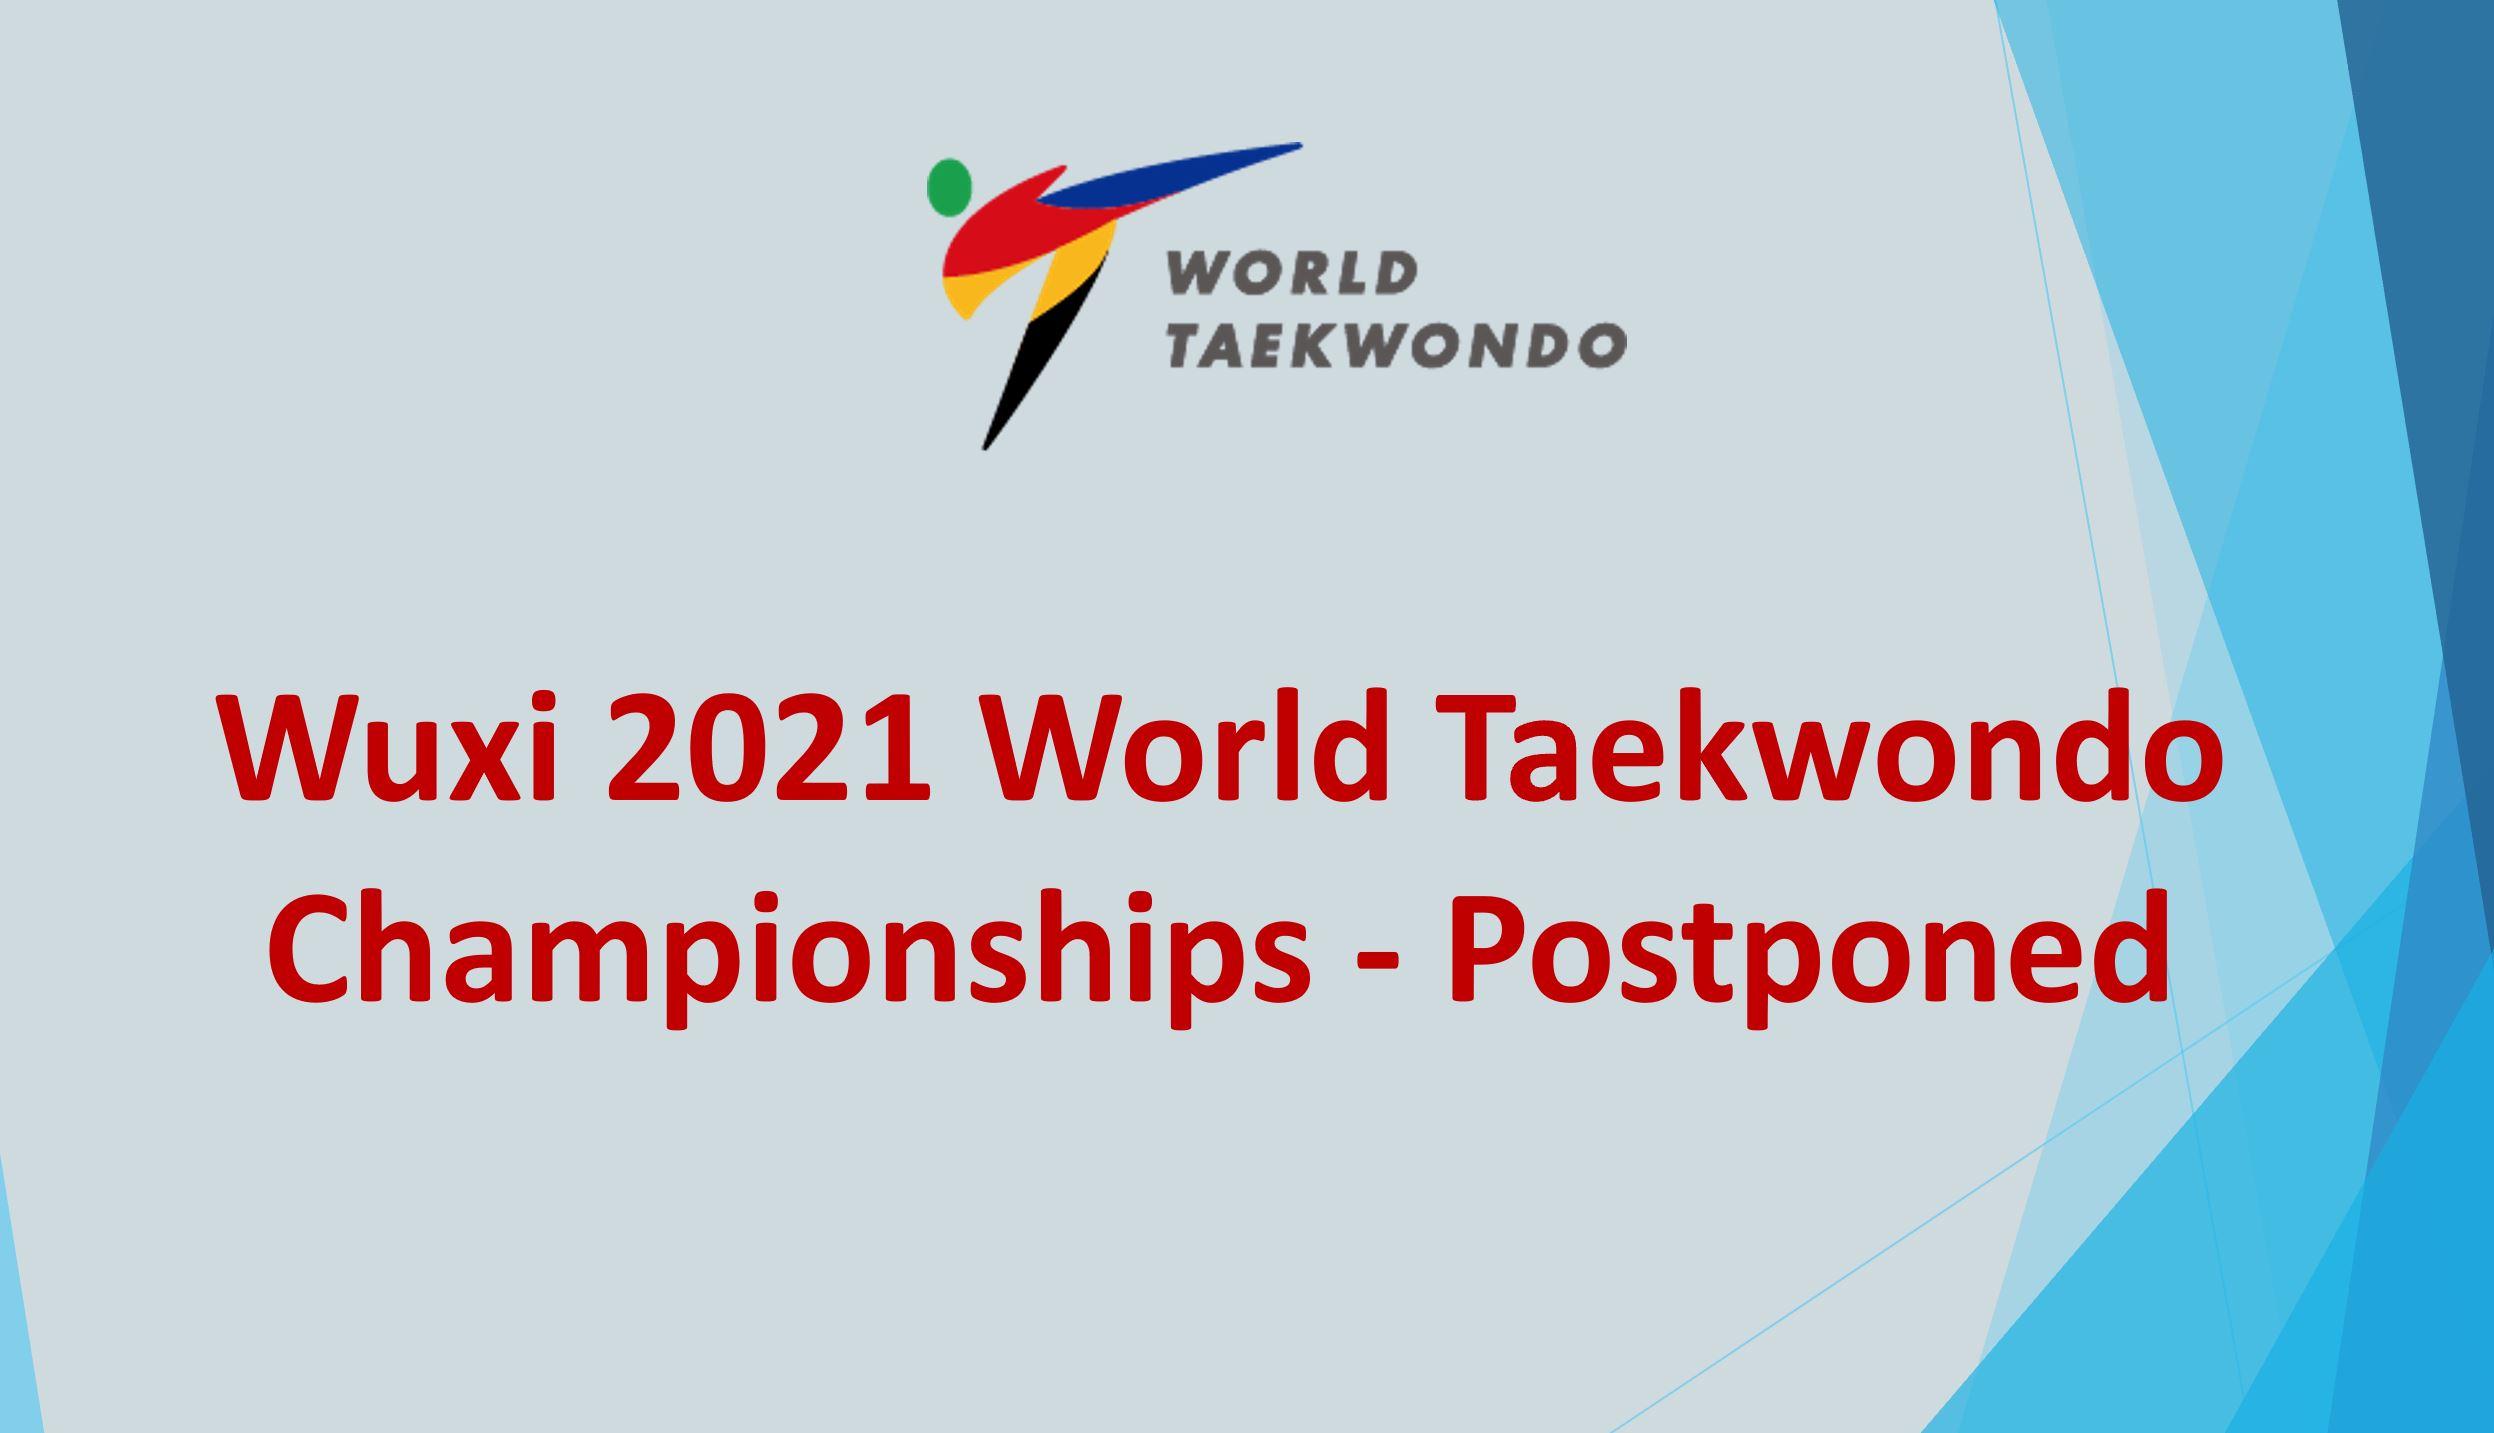 World Taekwondo Council announces postponement of Wuxi 2021 World Taekwondo Championships